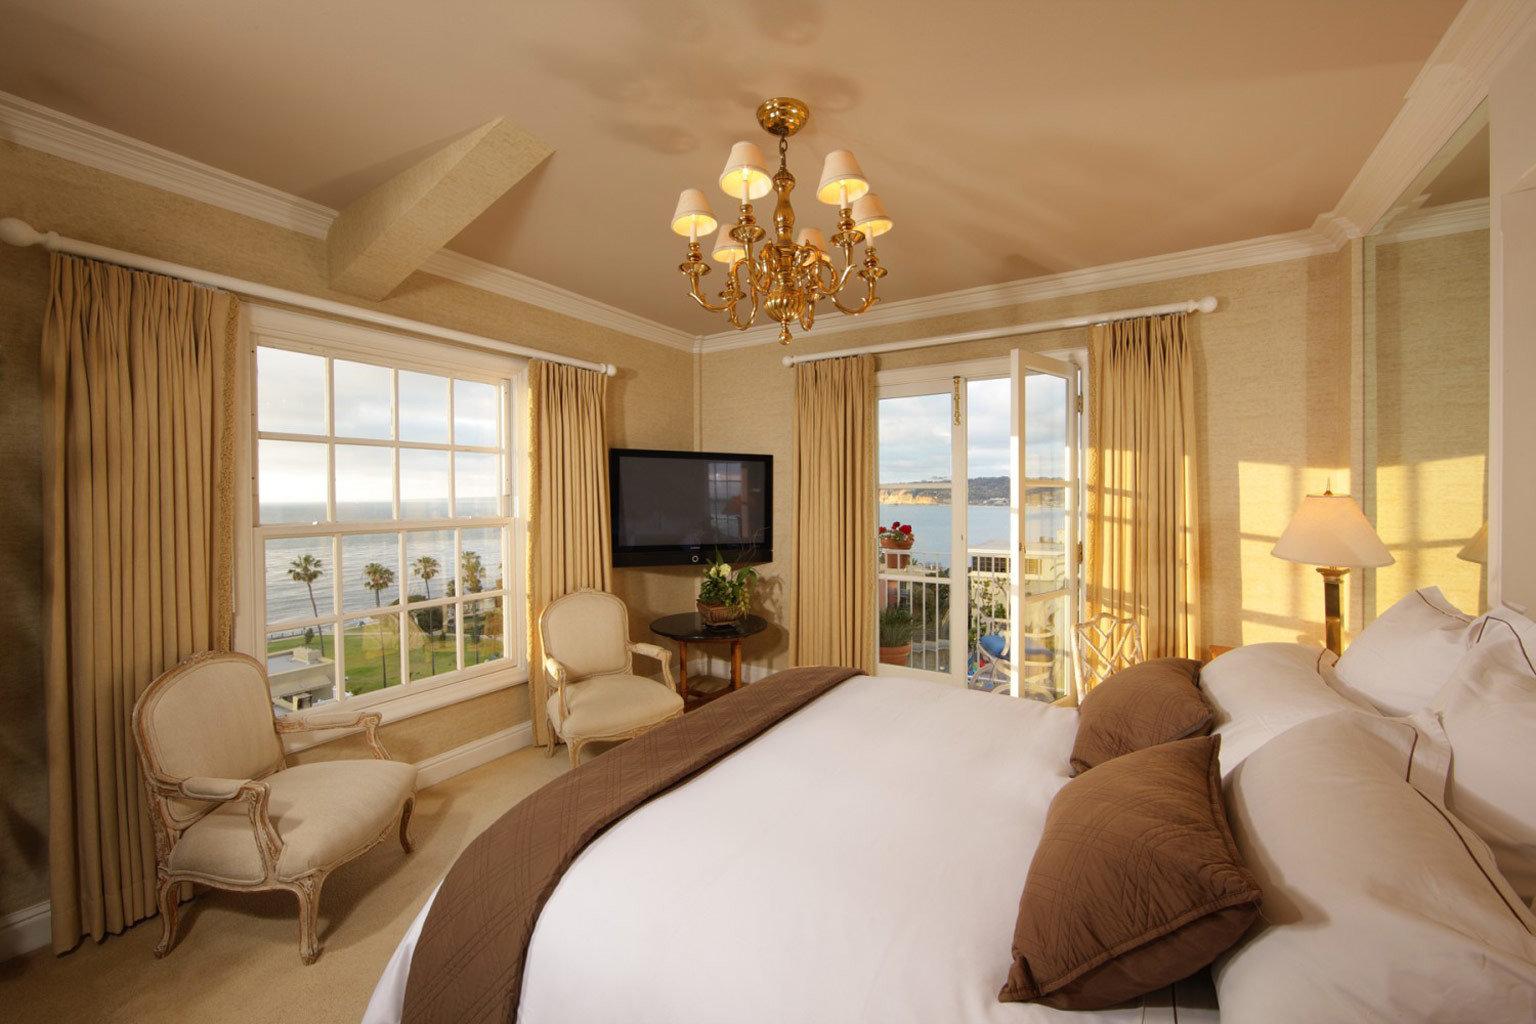 Beachfront Bedroom Elegant Hotels Luxury Ocean Scenic views Waterfront sofa property living room home Suite cottage